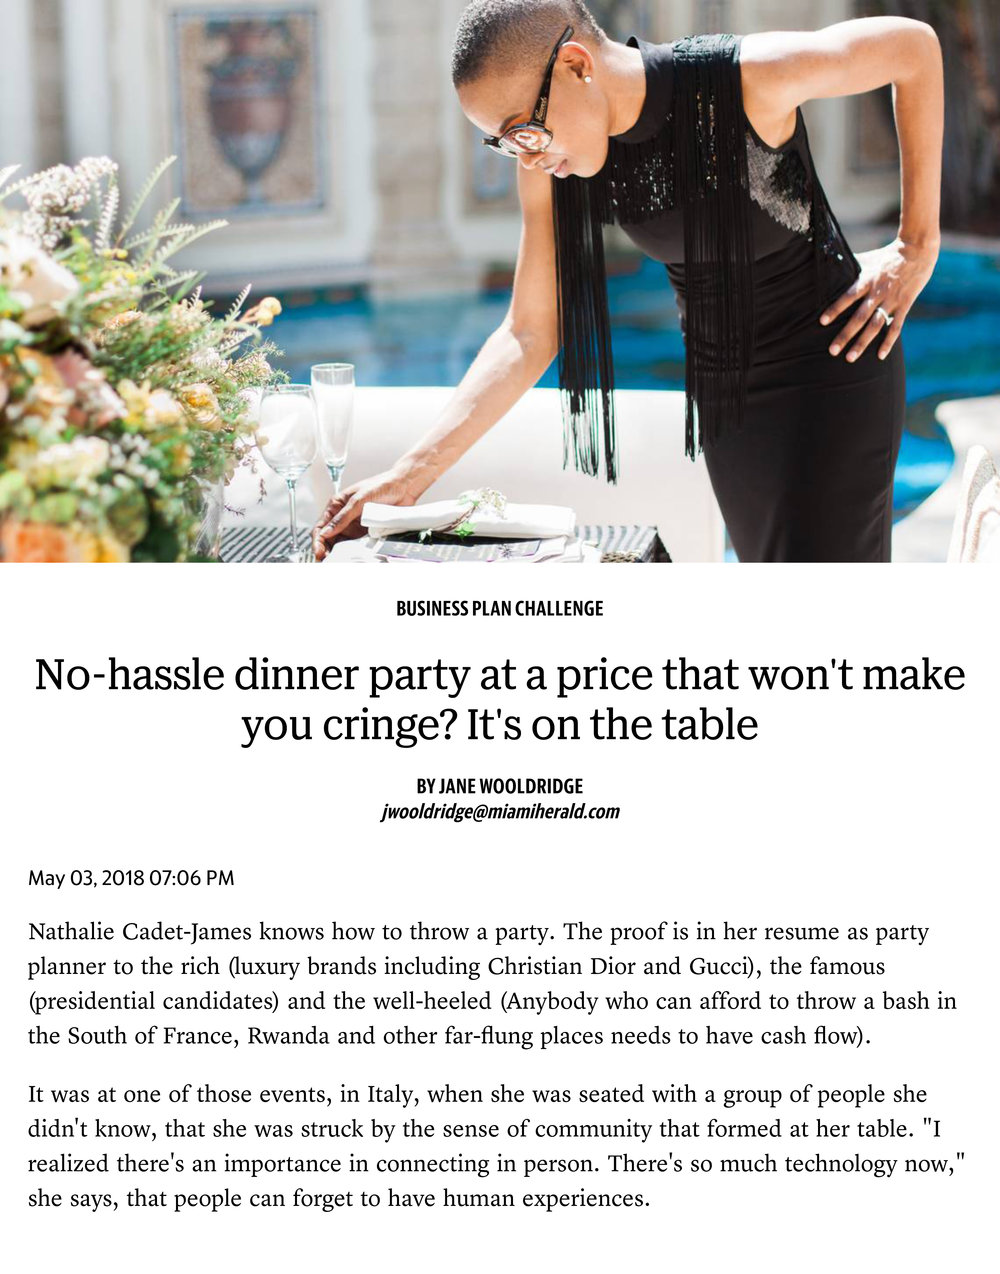 LuxeFete named 2018 Business Plan Challenge winner | Miami Herald-1.jpg